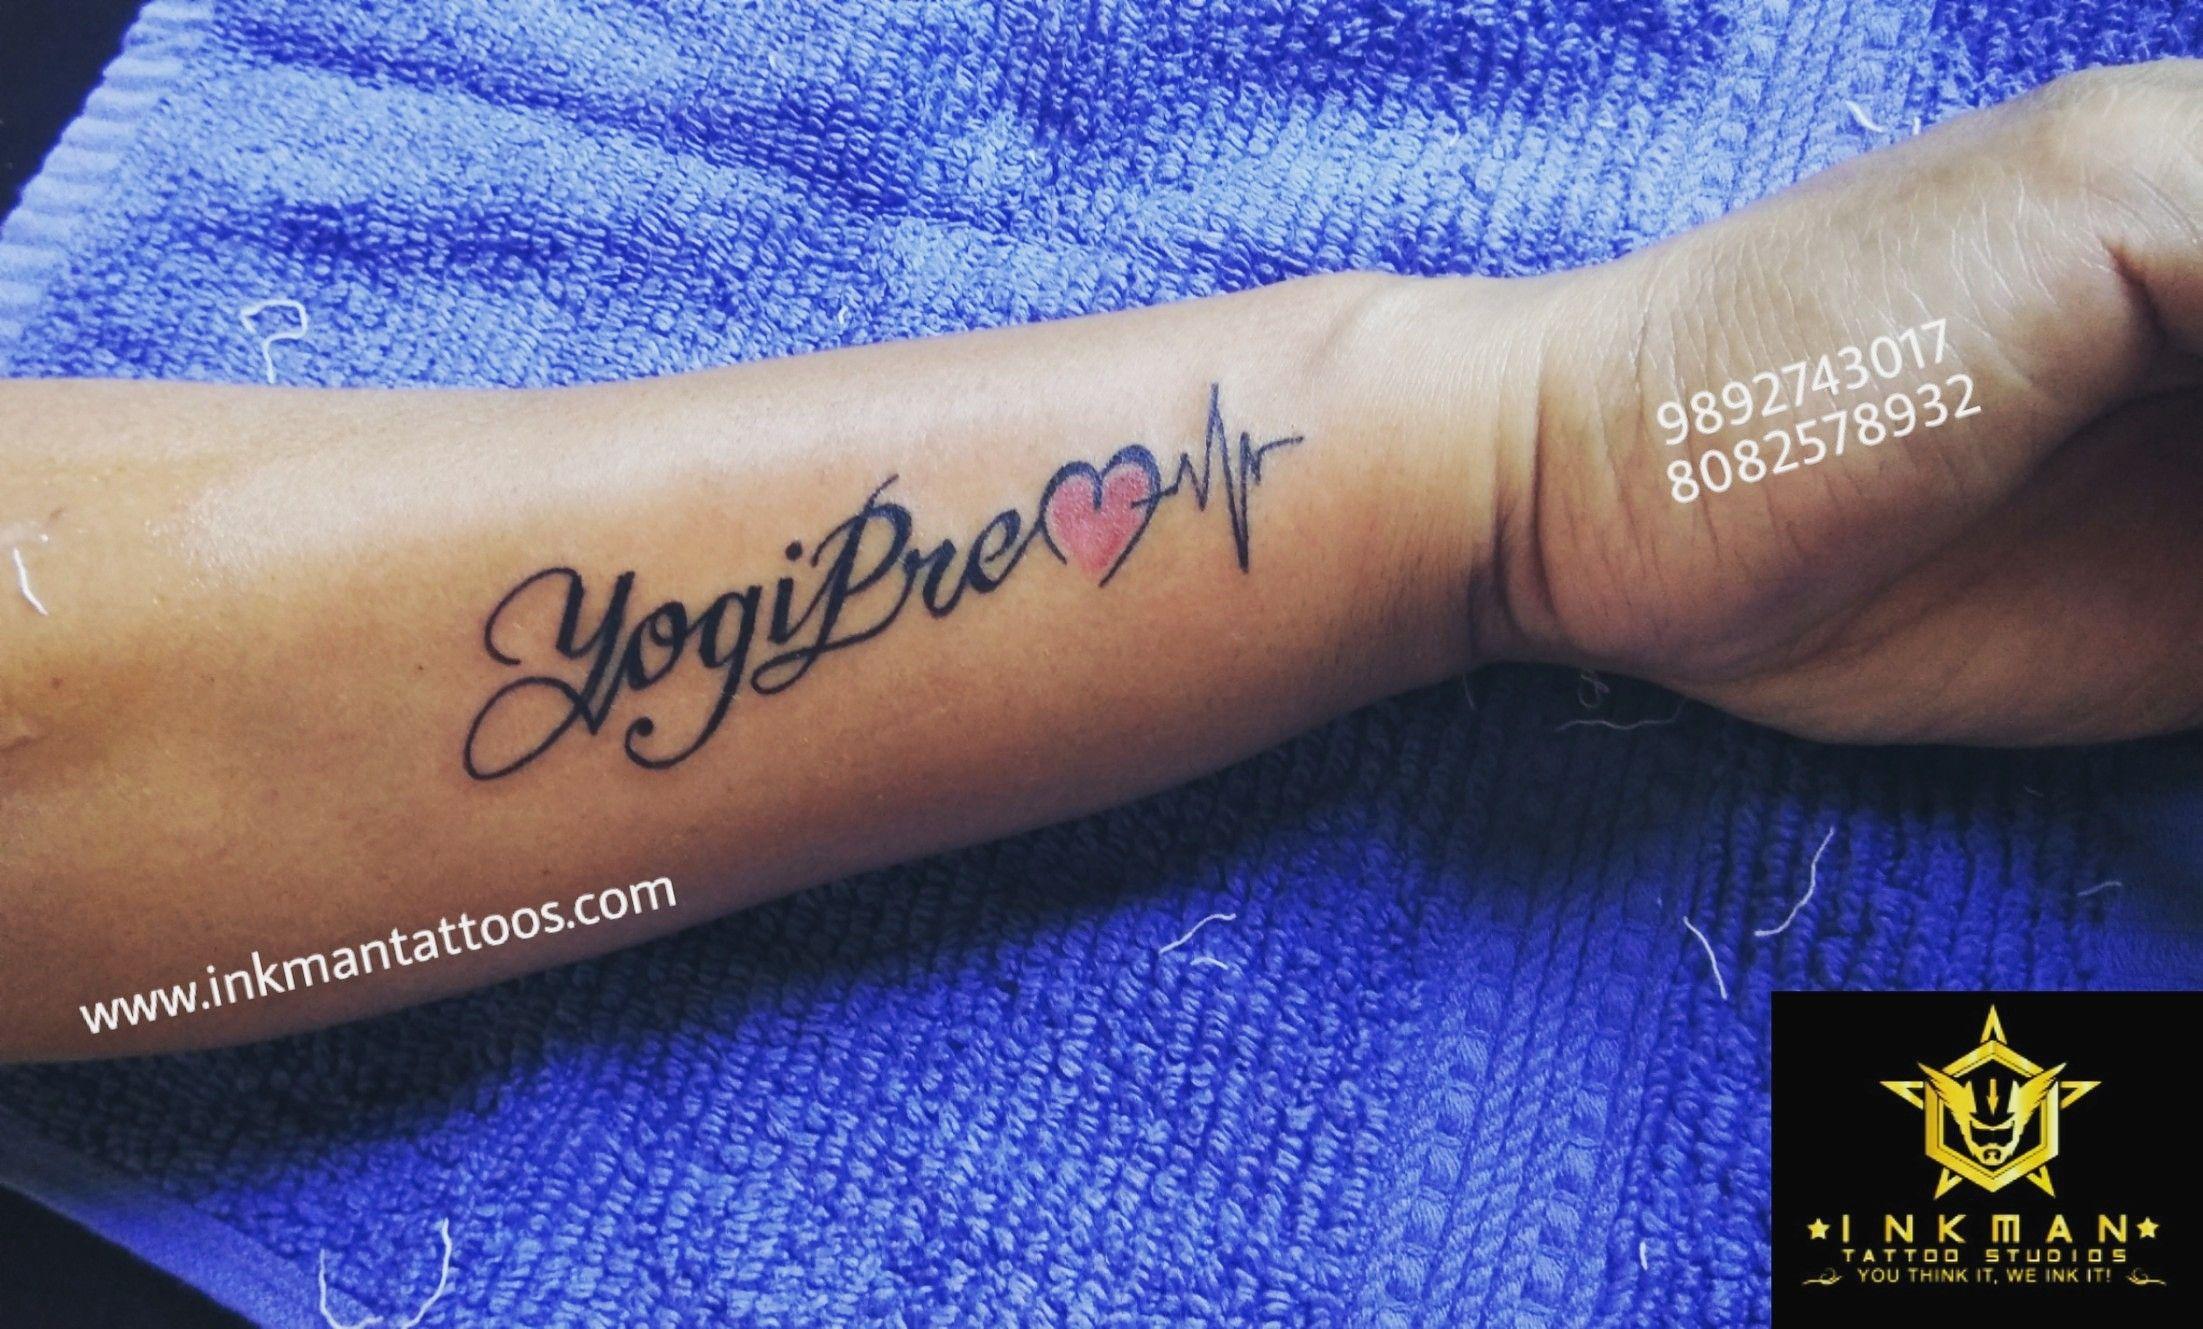 Name Tattoo Tattoo Designs For Men In 2020 Tattoo Designs Men Name Tattoo Tattoos